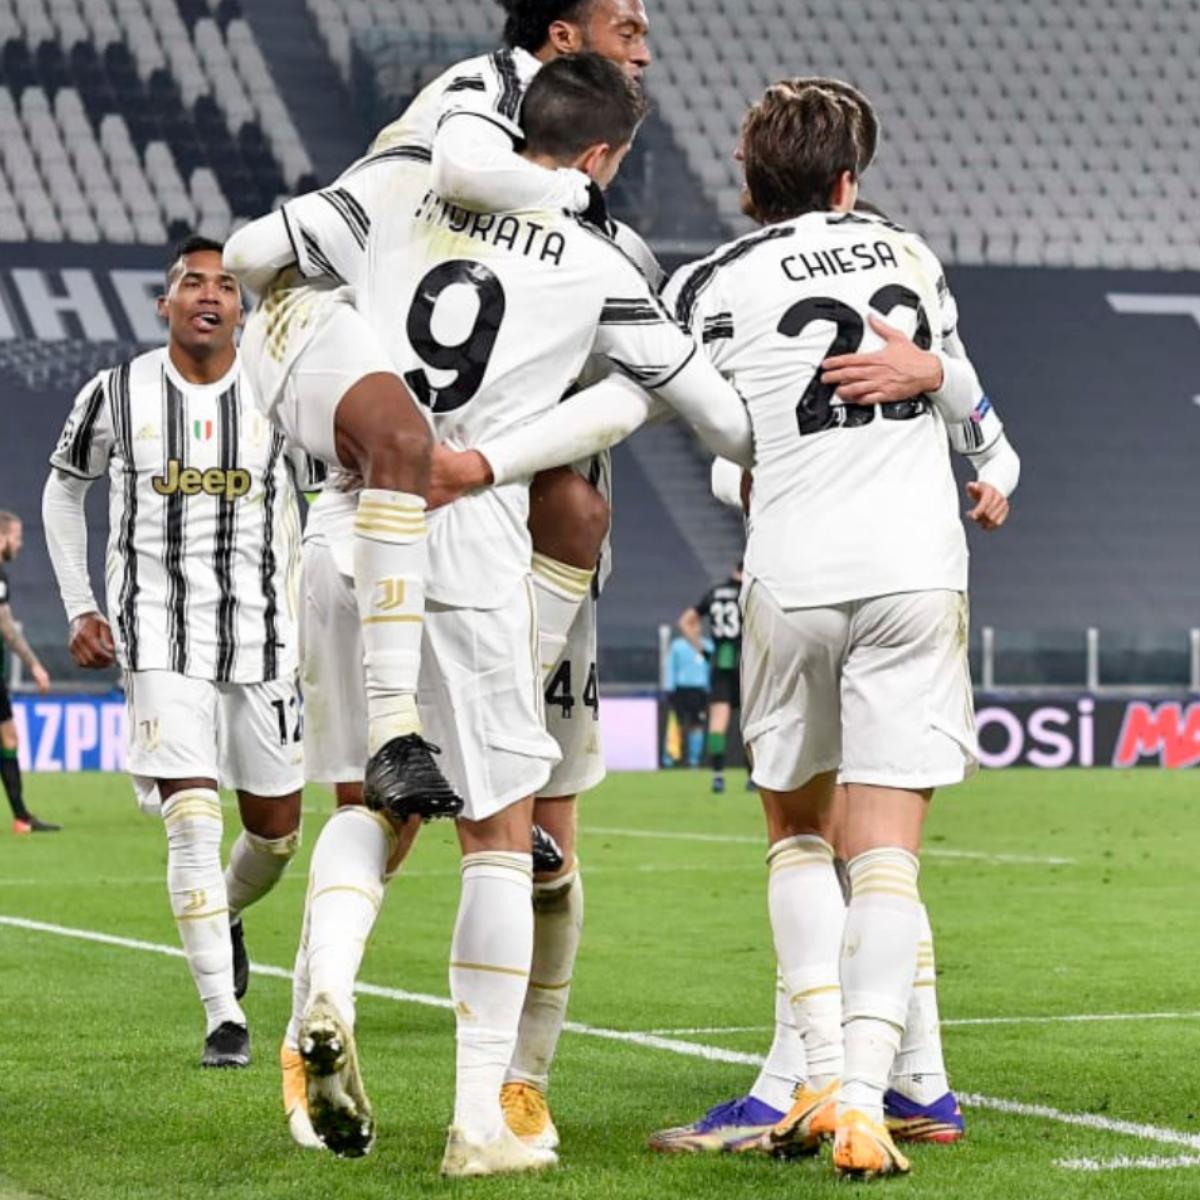 Juventus-Spezia probabili formazioni